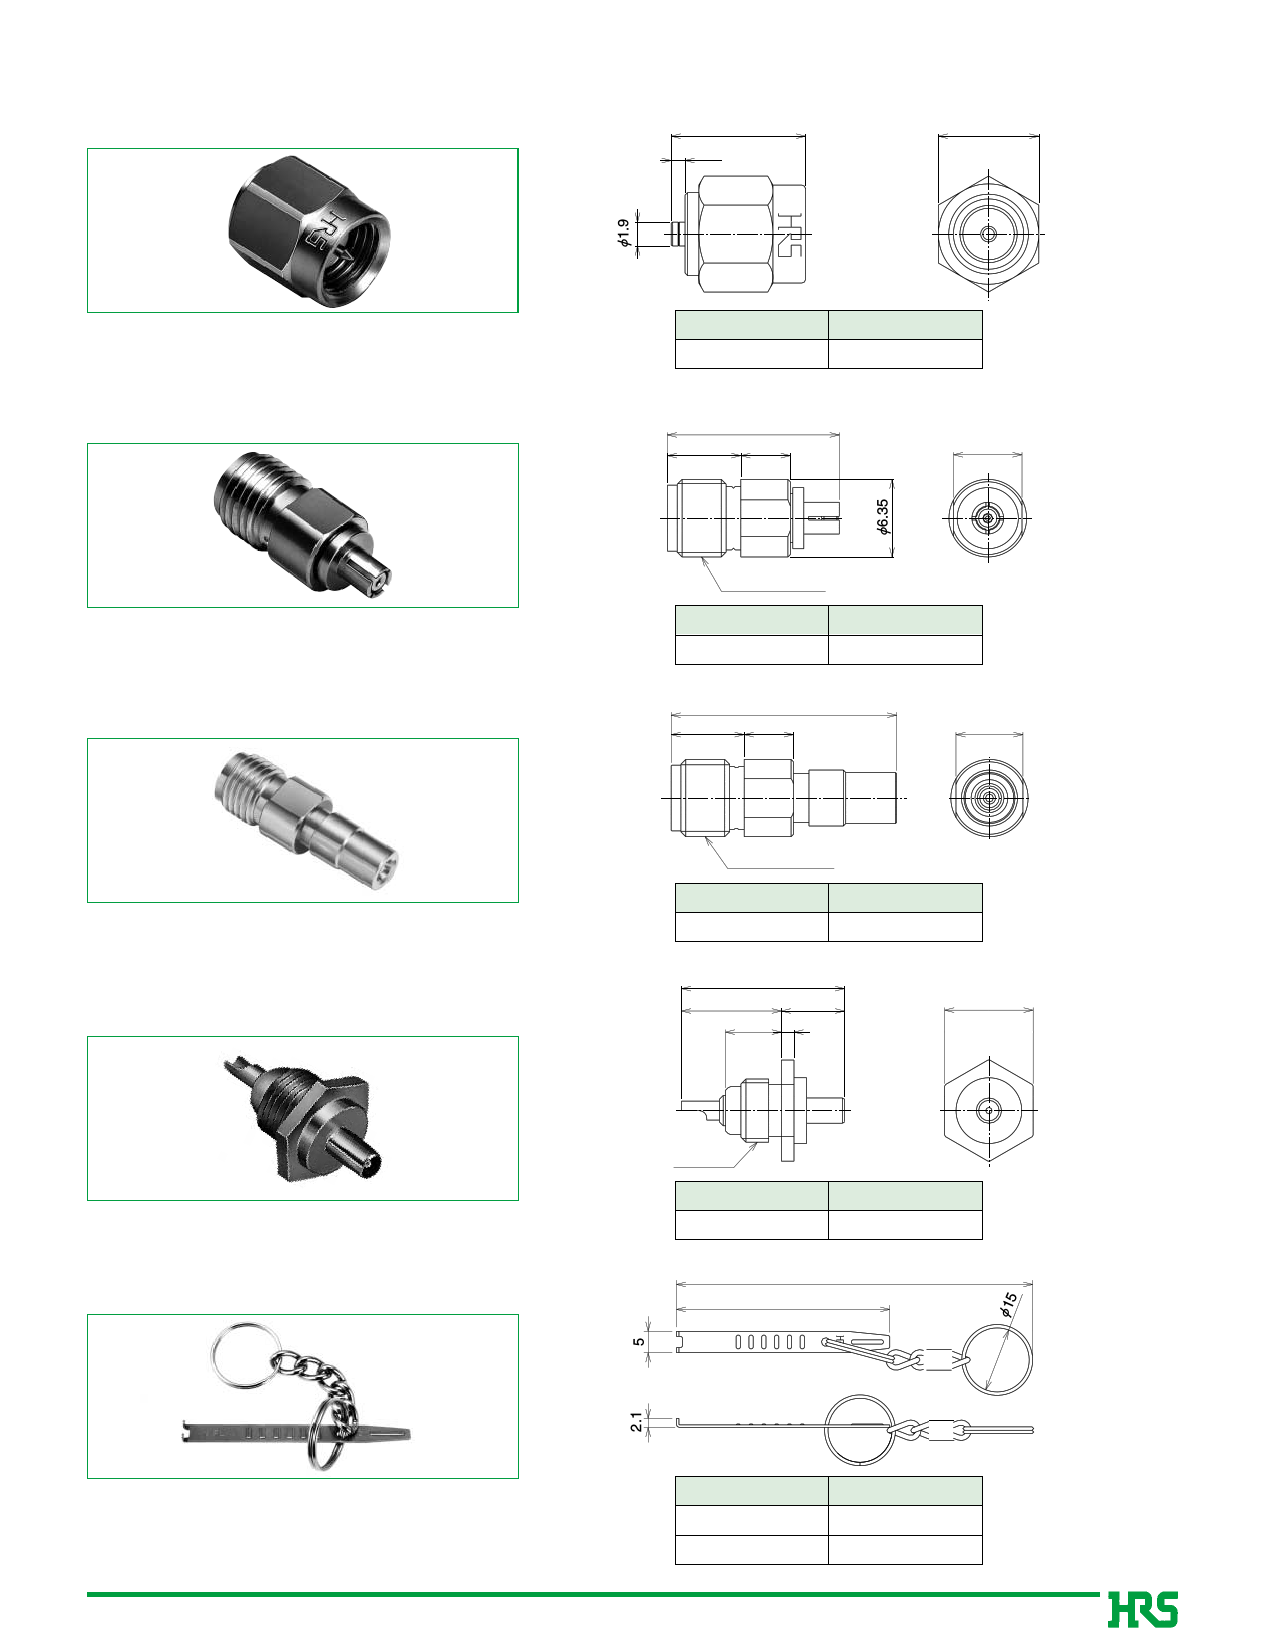 U.FL-R-1 pdf